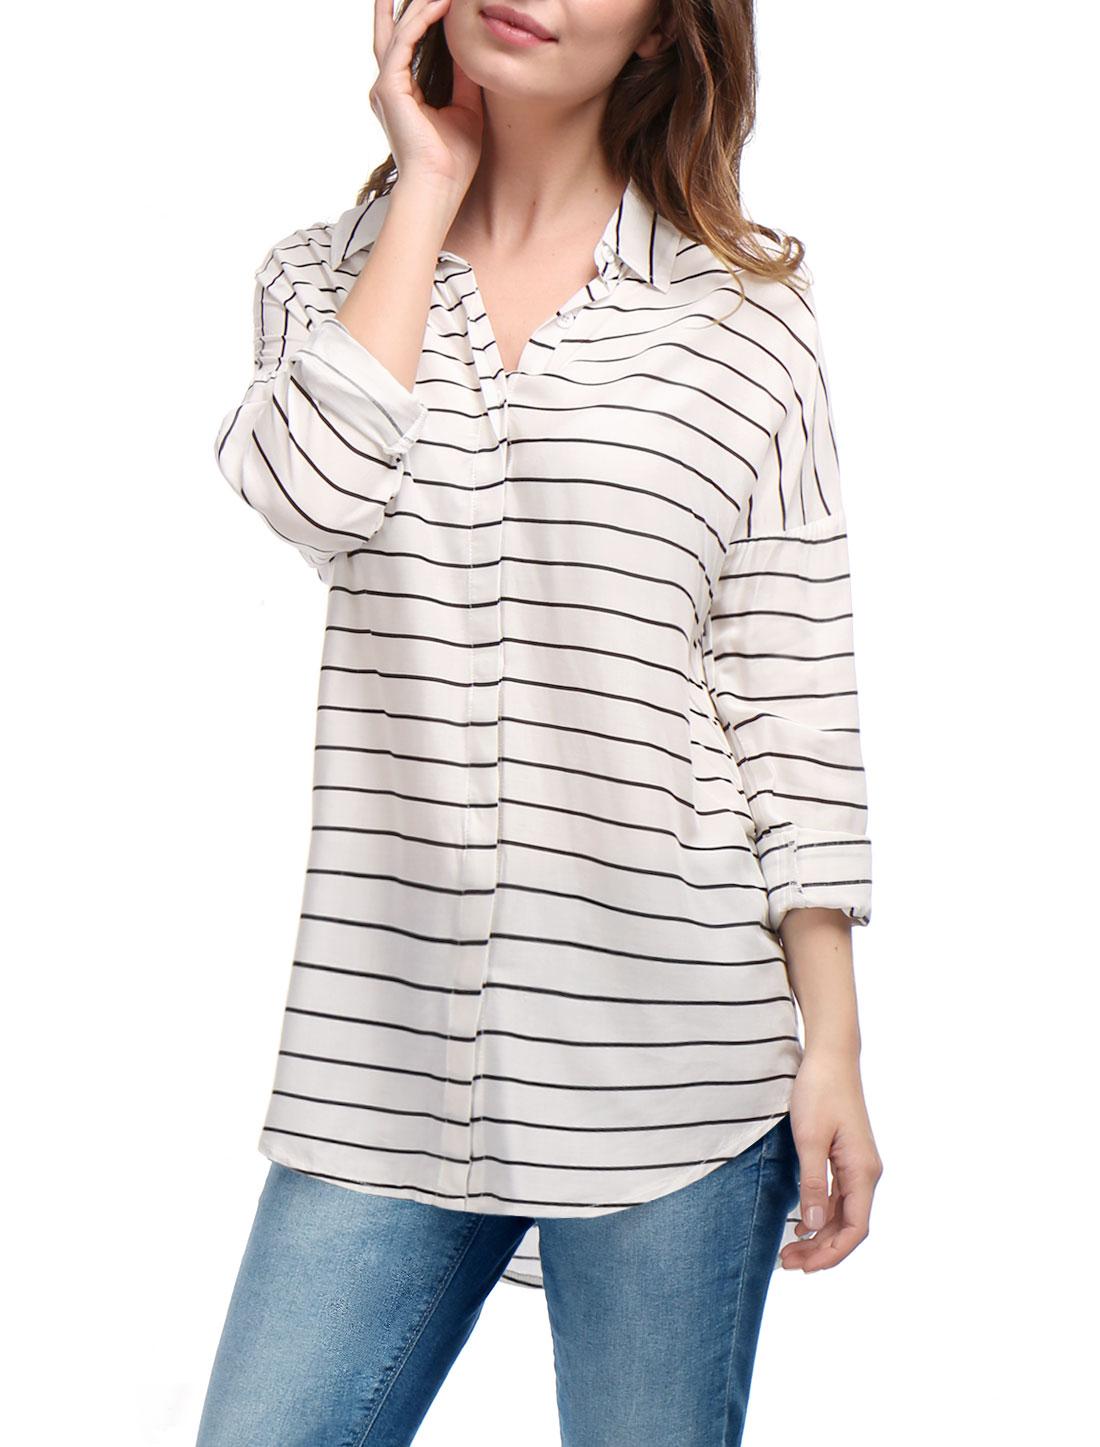 Allegra K Women Stripes Drop Shoulder Hi-Lo Loose Tunic Shirt White M